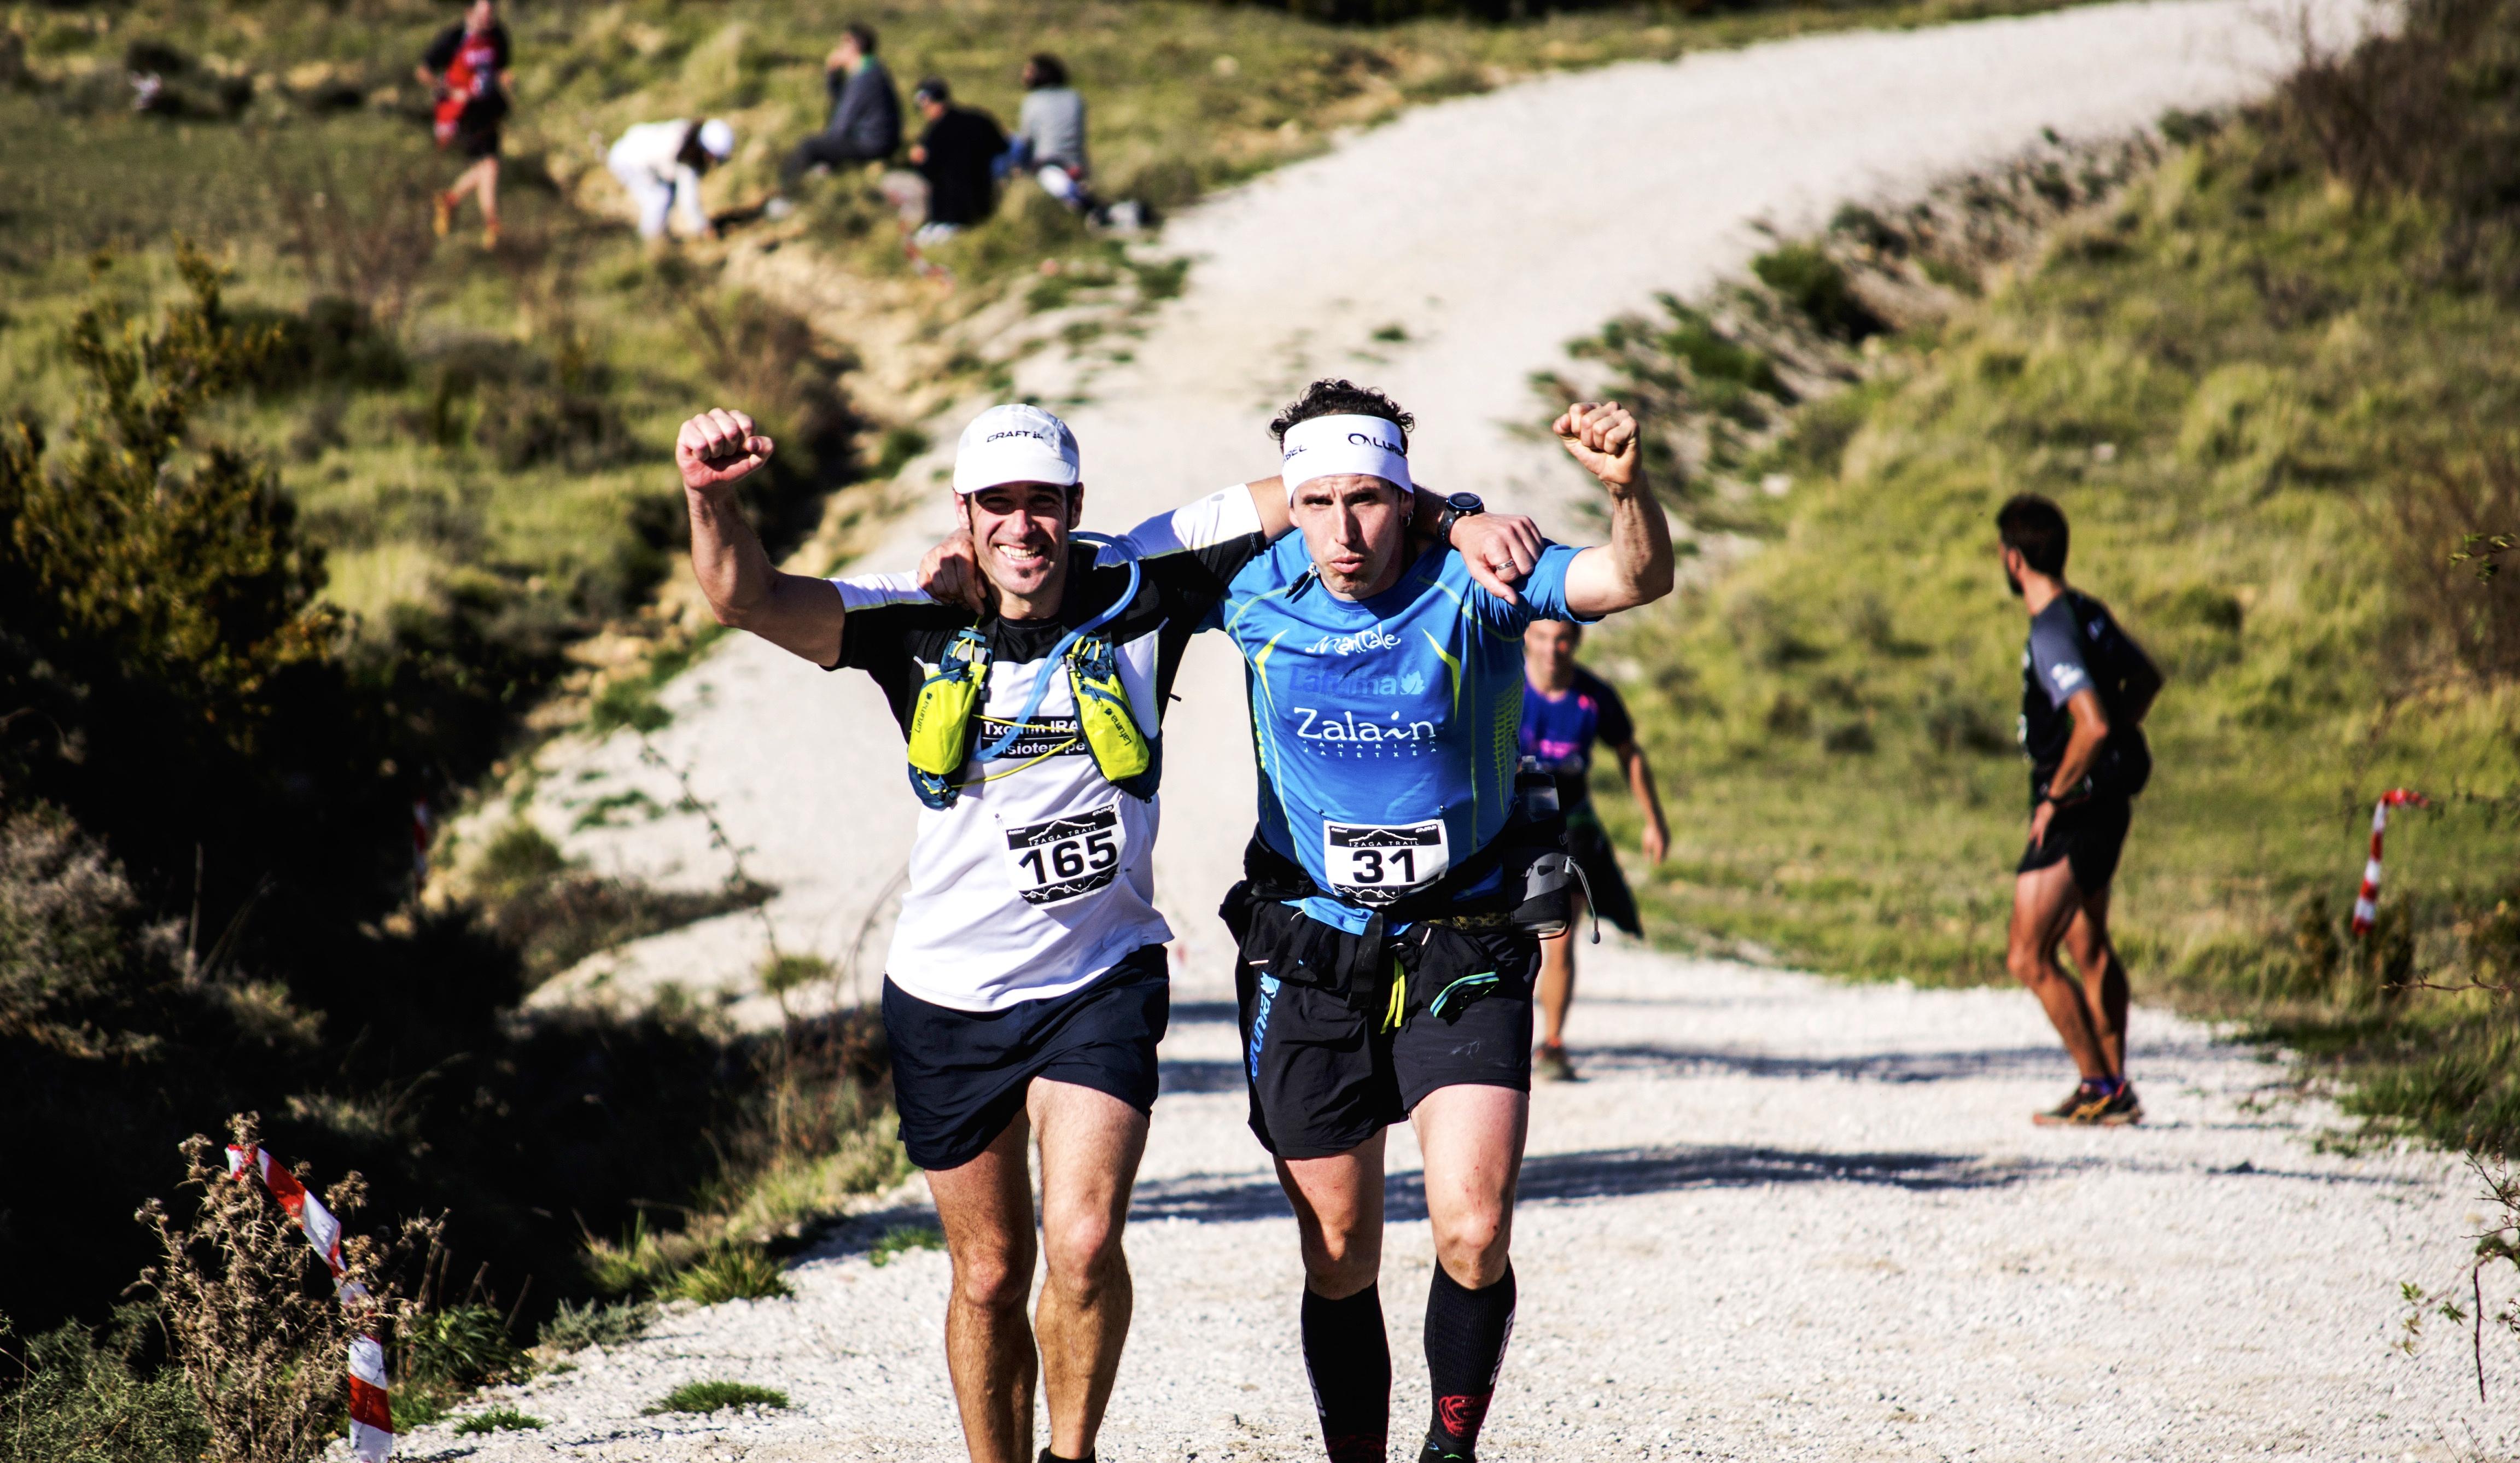 Compañeros carrera Izaga Trail